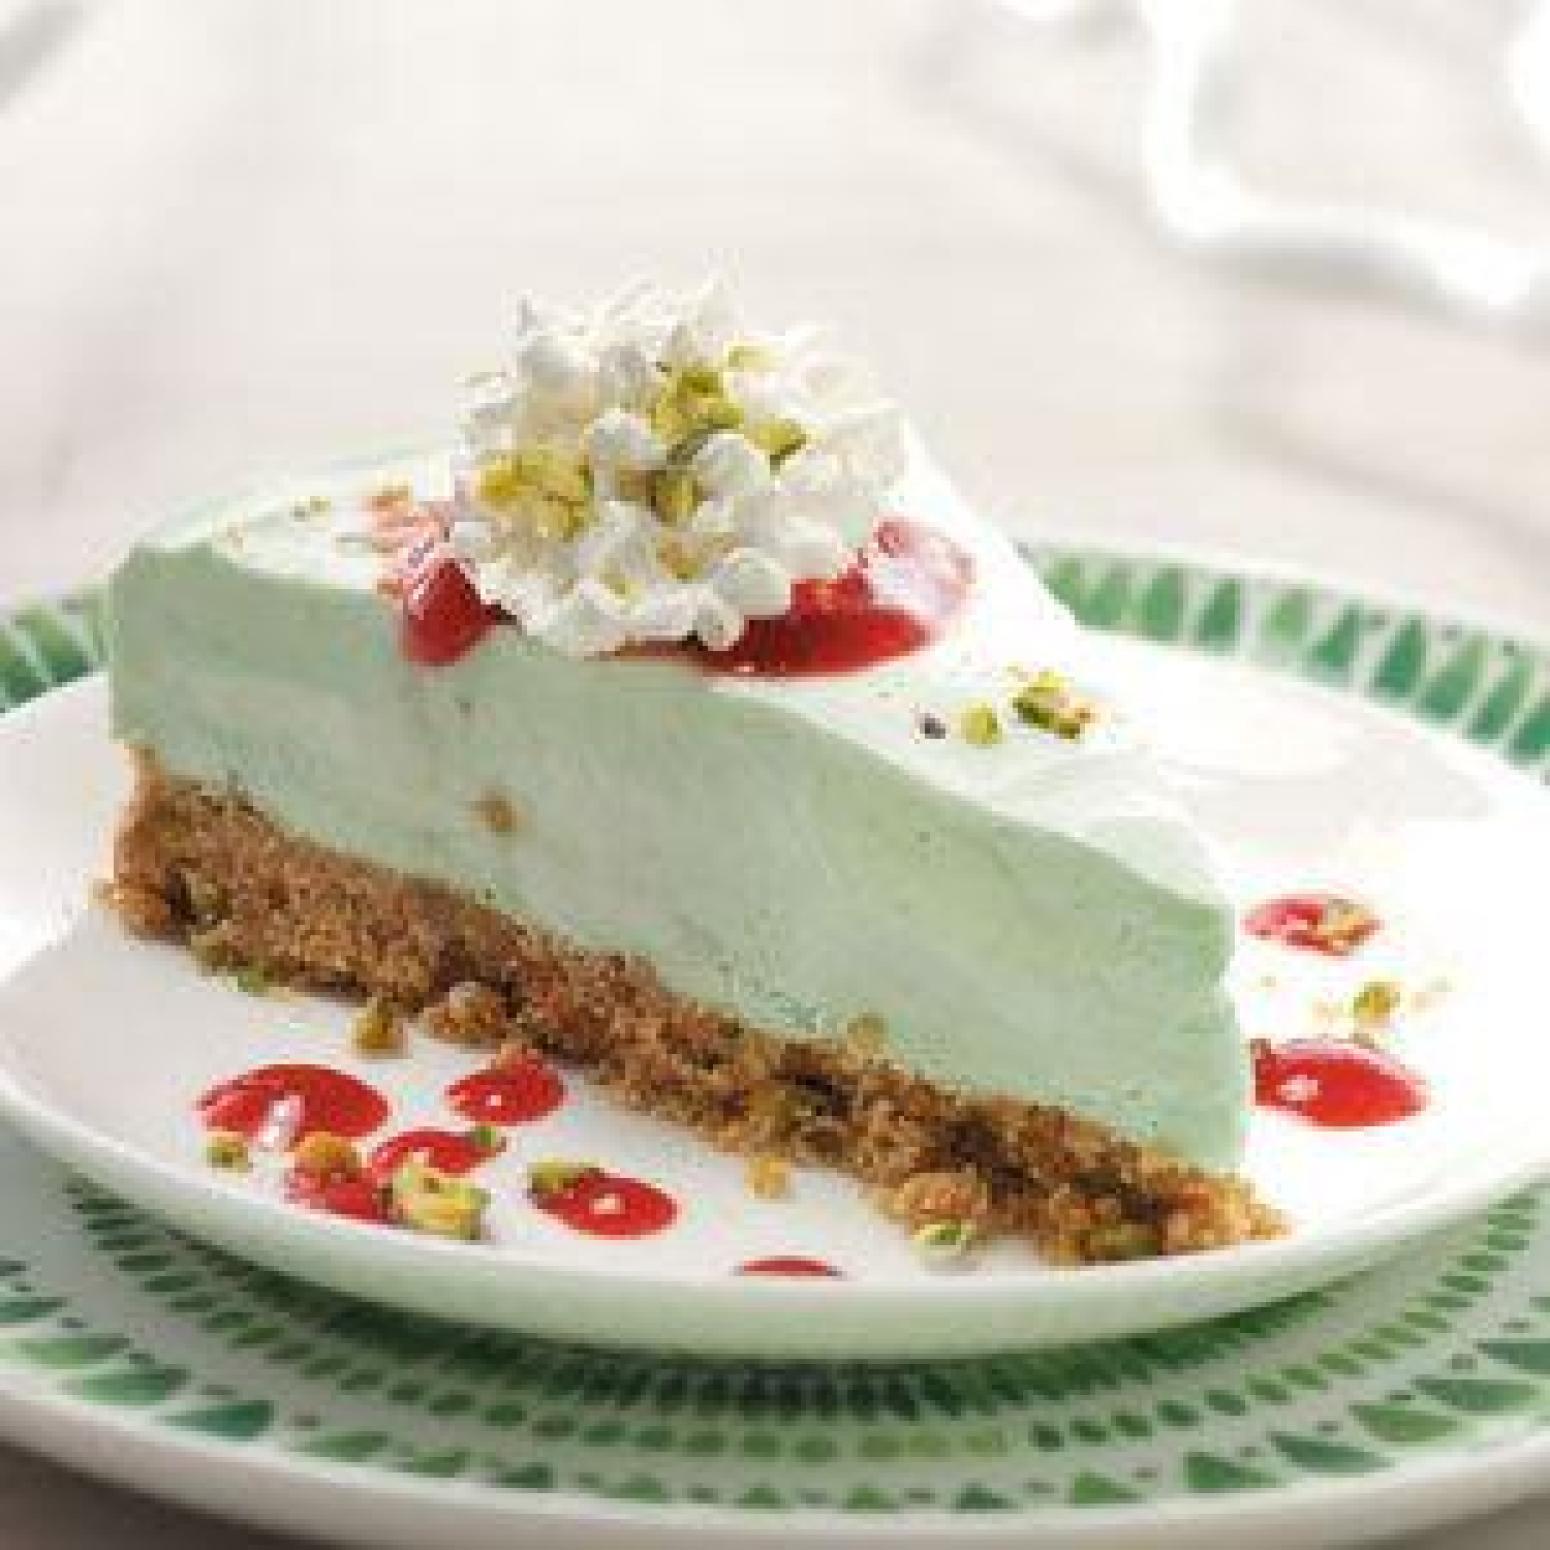 Pistachio Pudding Dessert Recipes  Frozen Pistachio Dessert With Raspberry Sauce Recipe